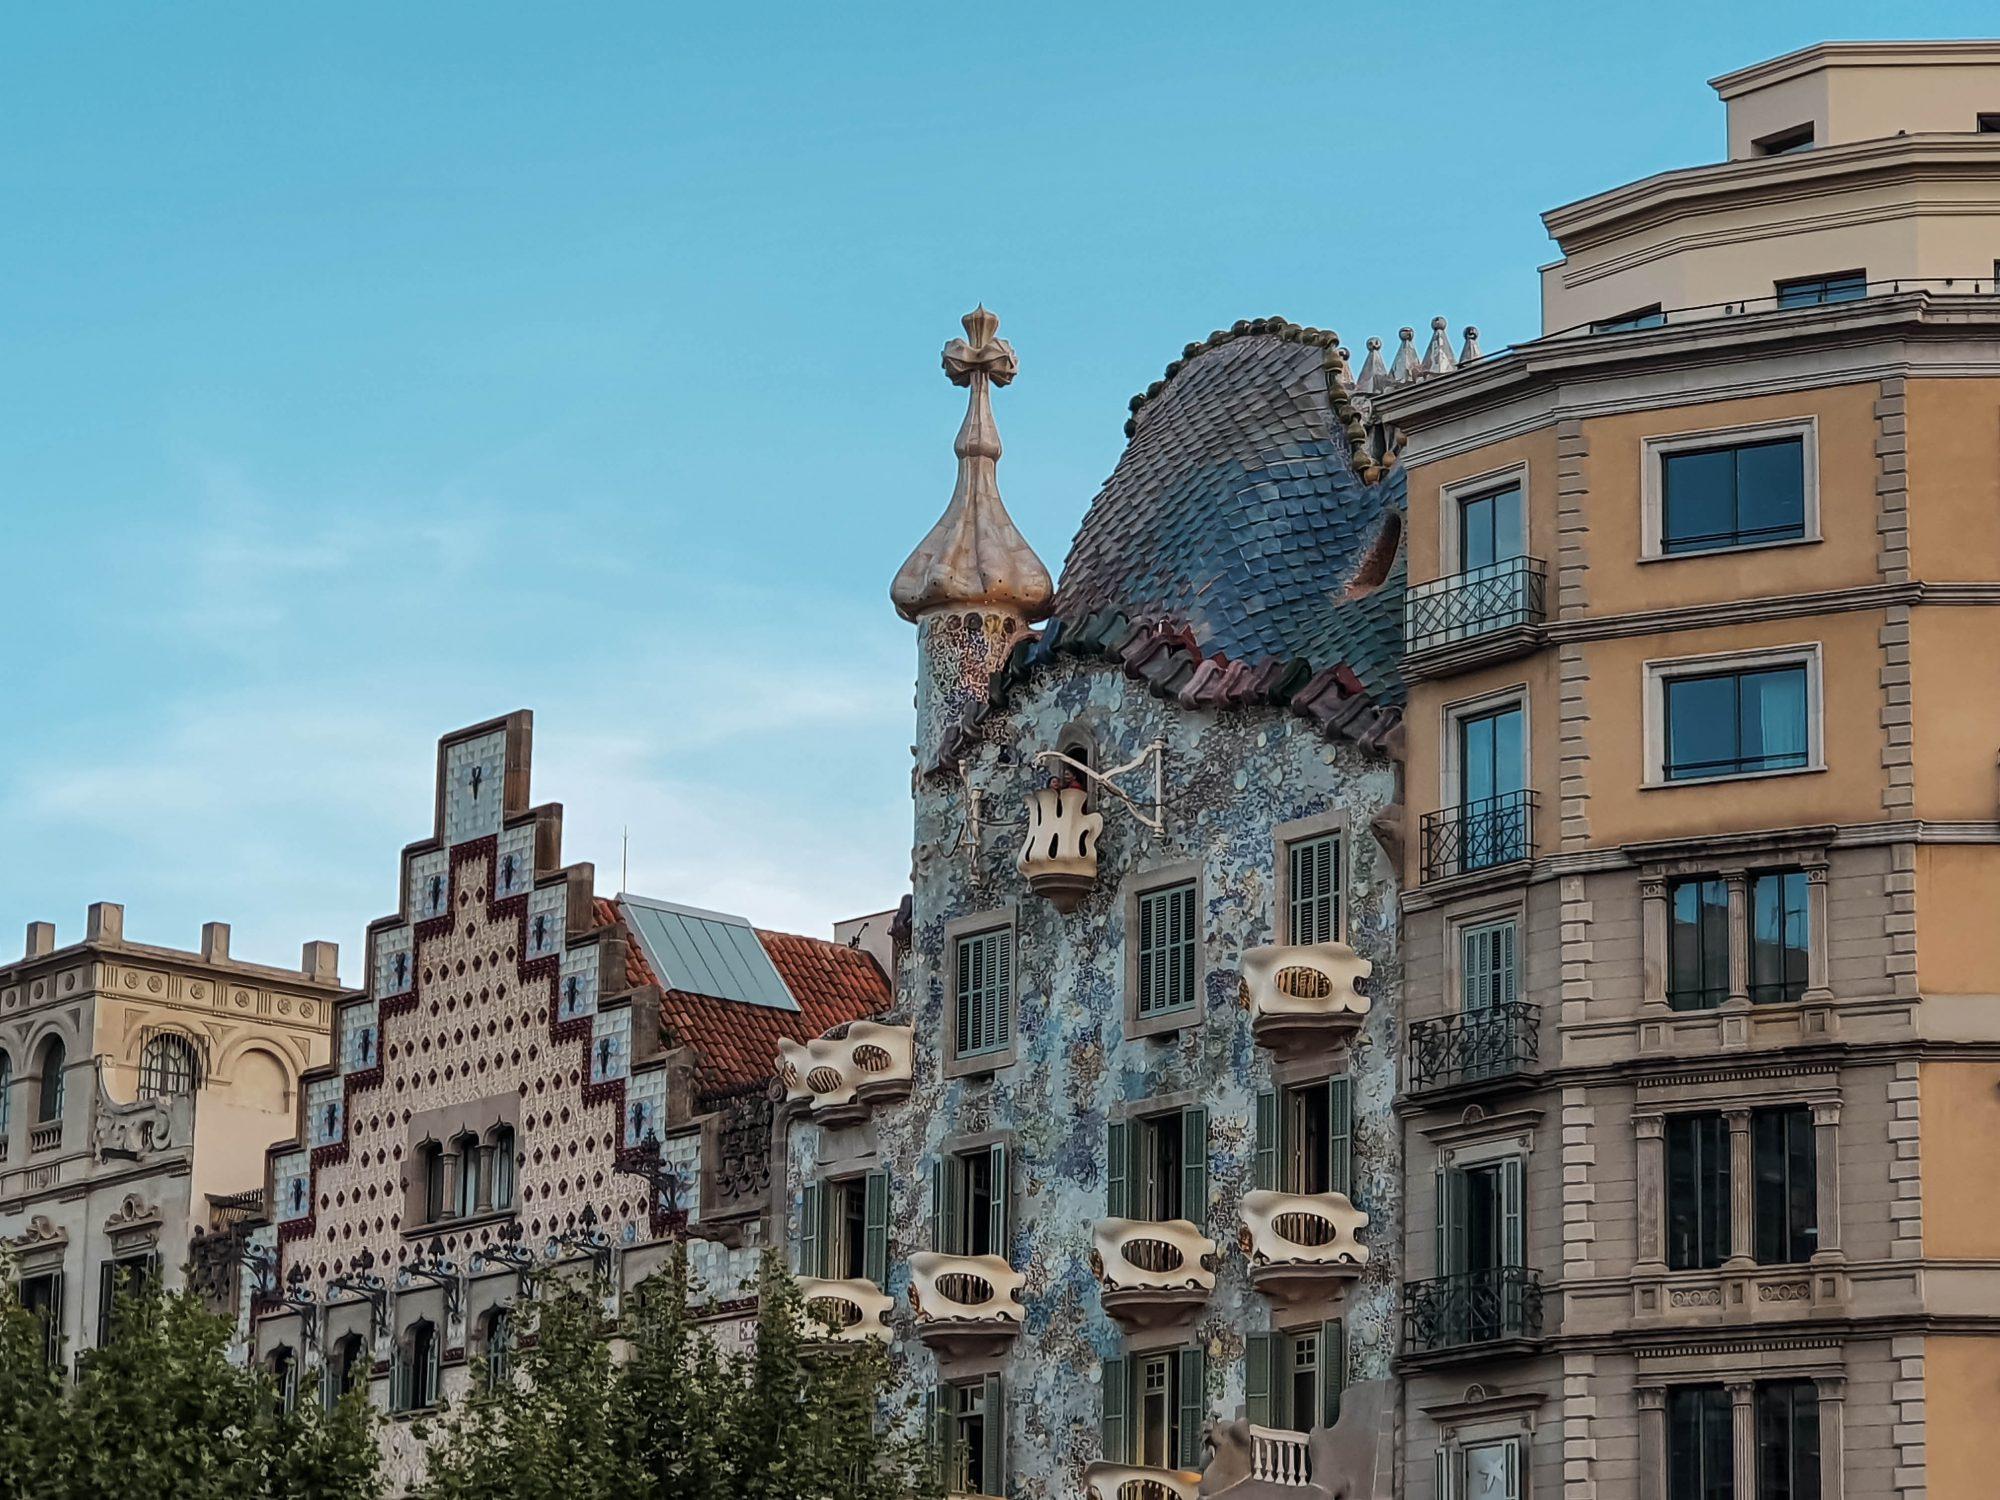 Summer in Barcelona!